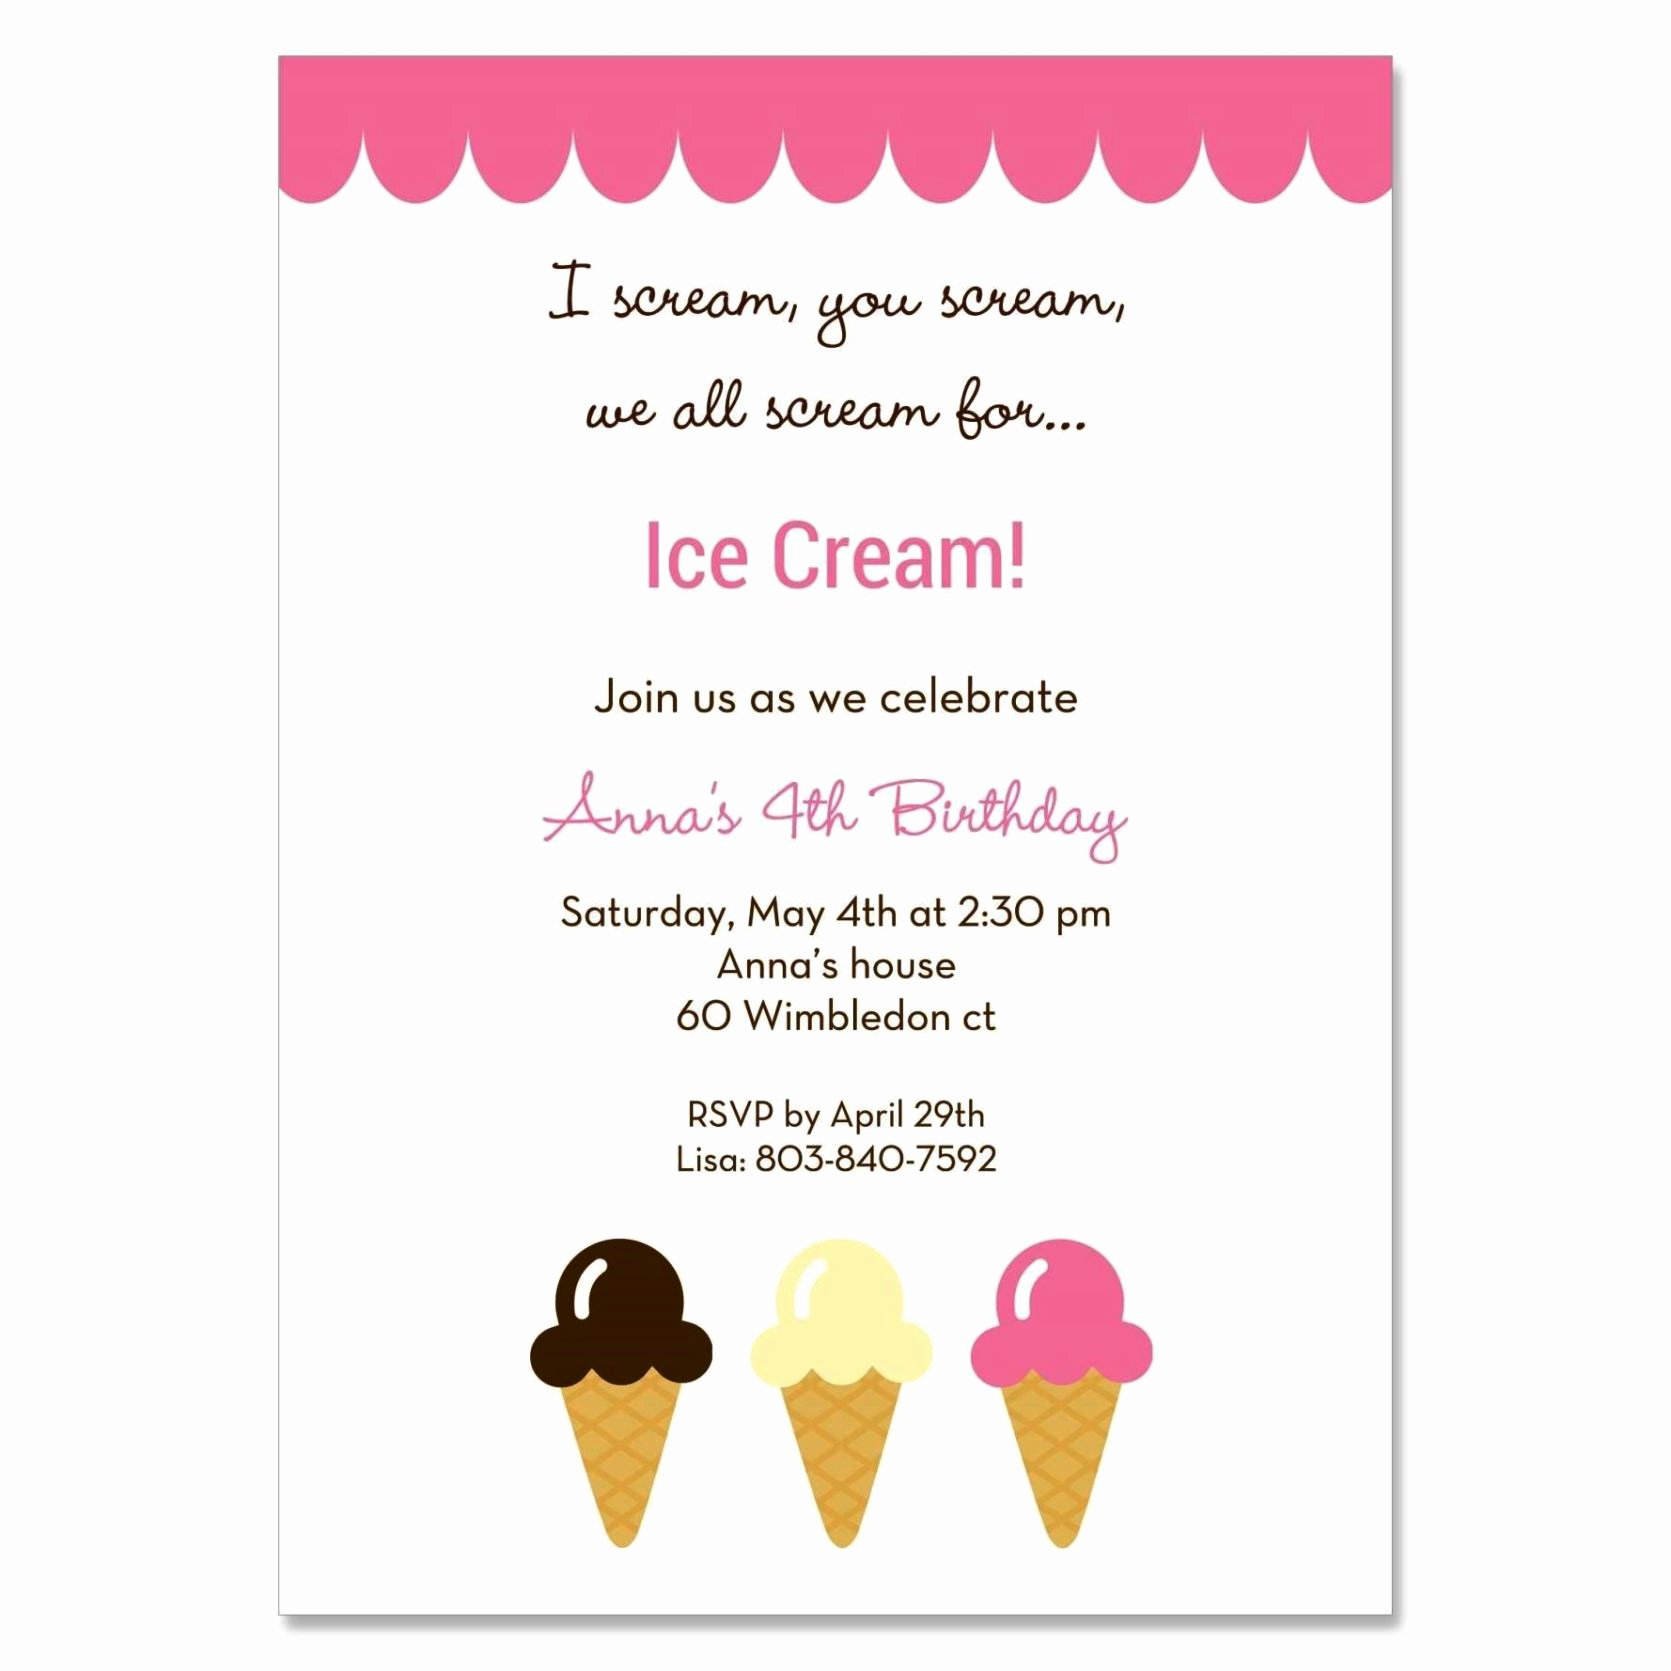 Ice Cream social Invite Template Fresh Ice Cream social Invitation Template Sampletemplatess